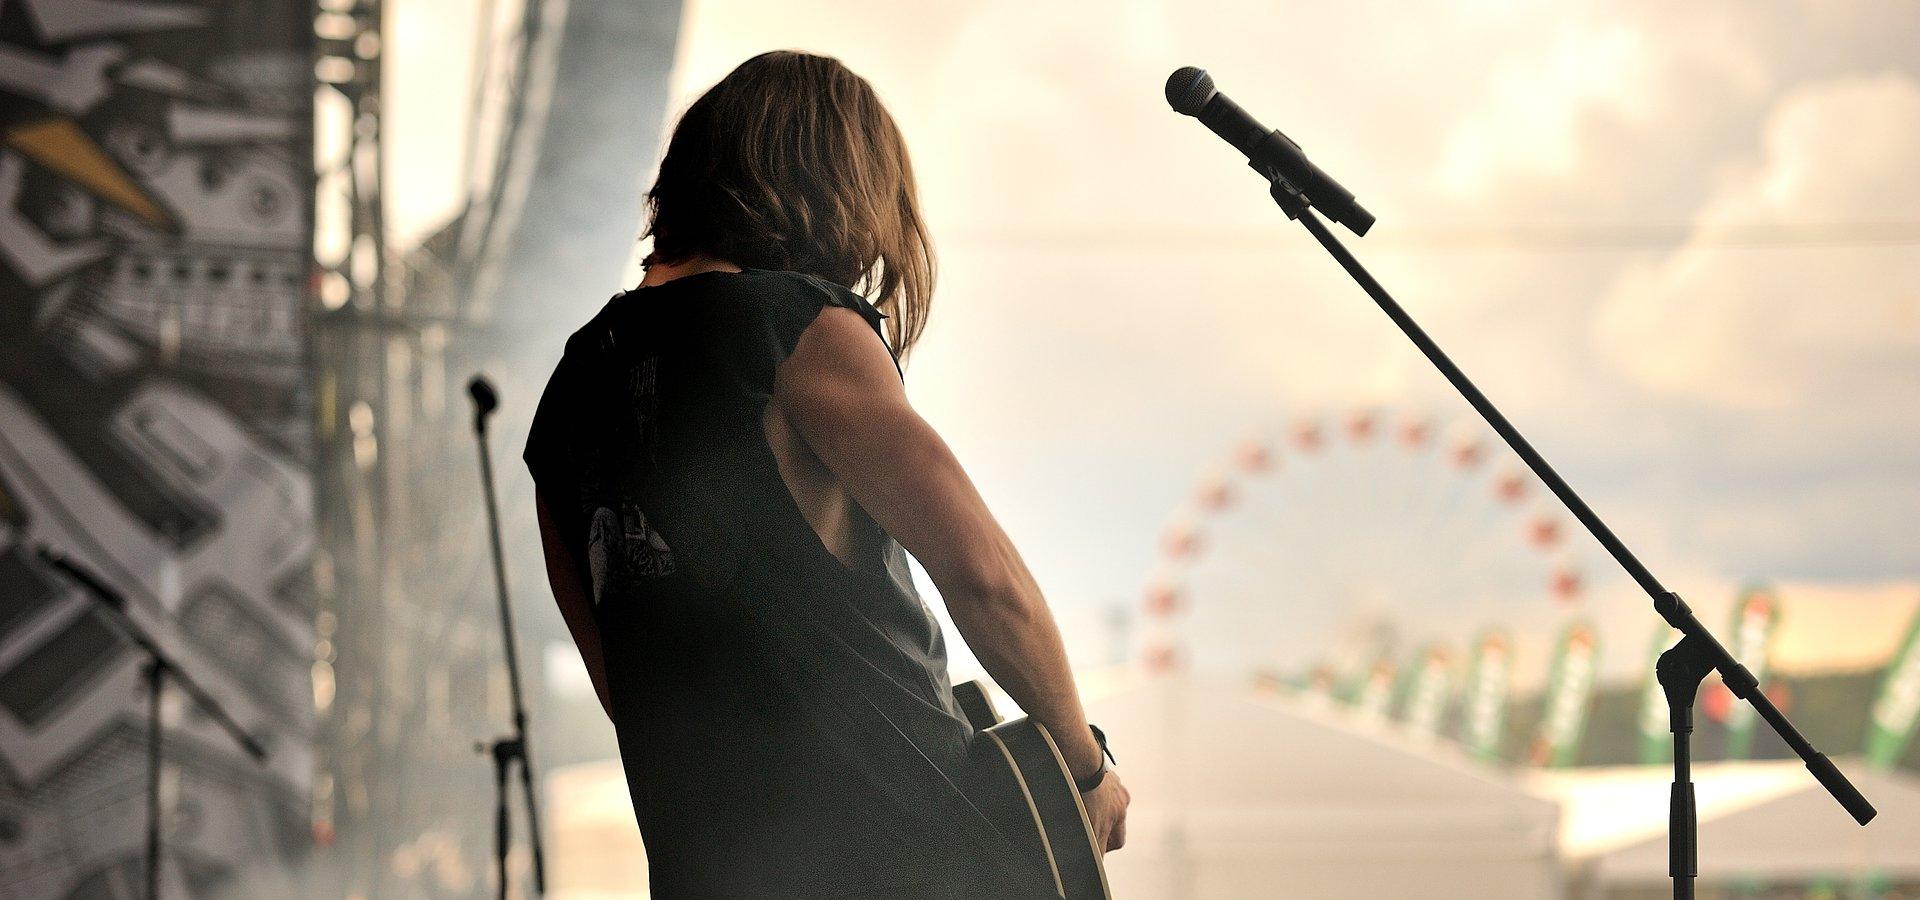 Laureat Antyfestu zagra na Pol'and'Rock Festival